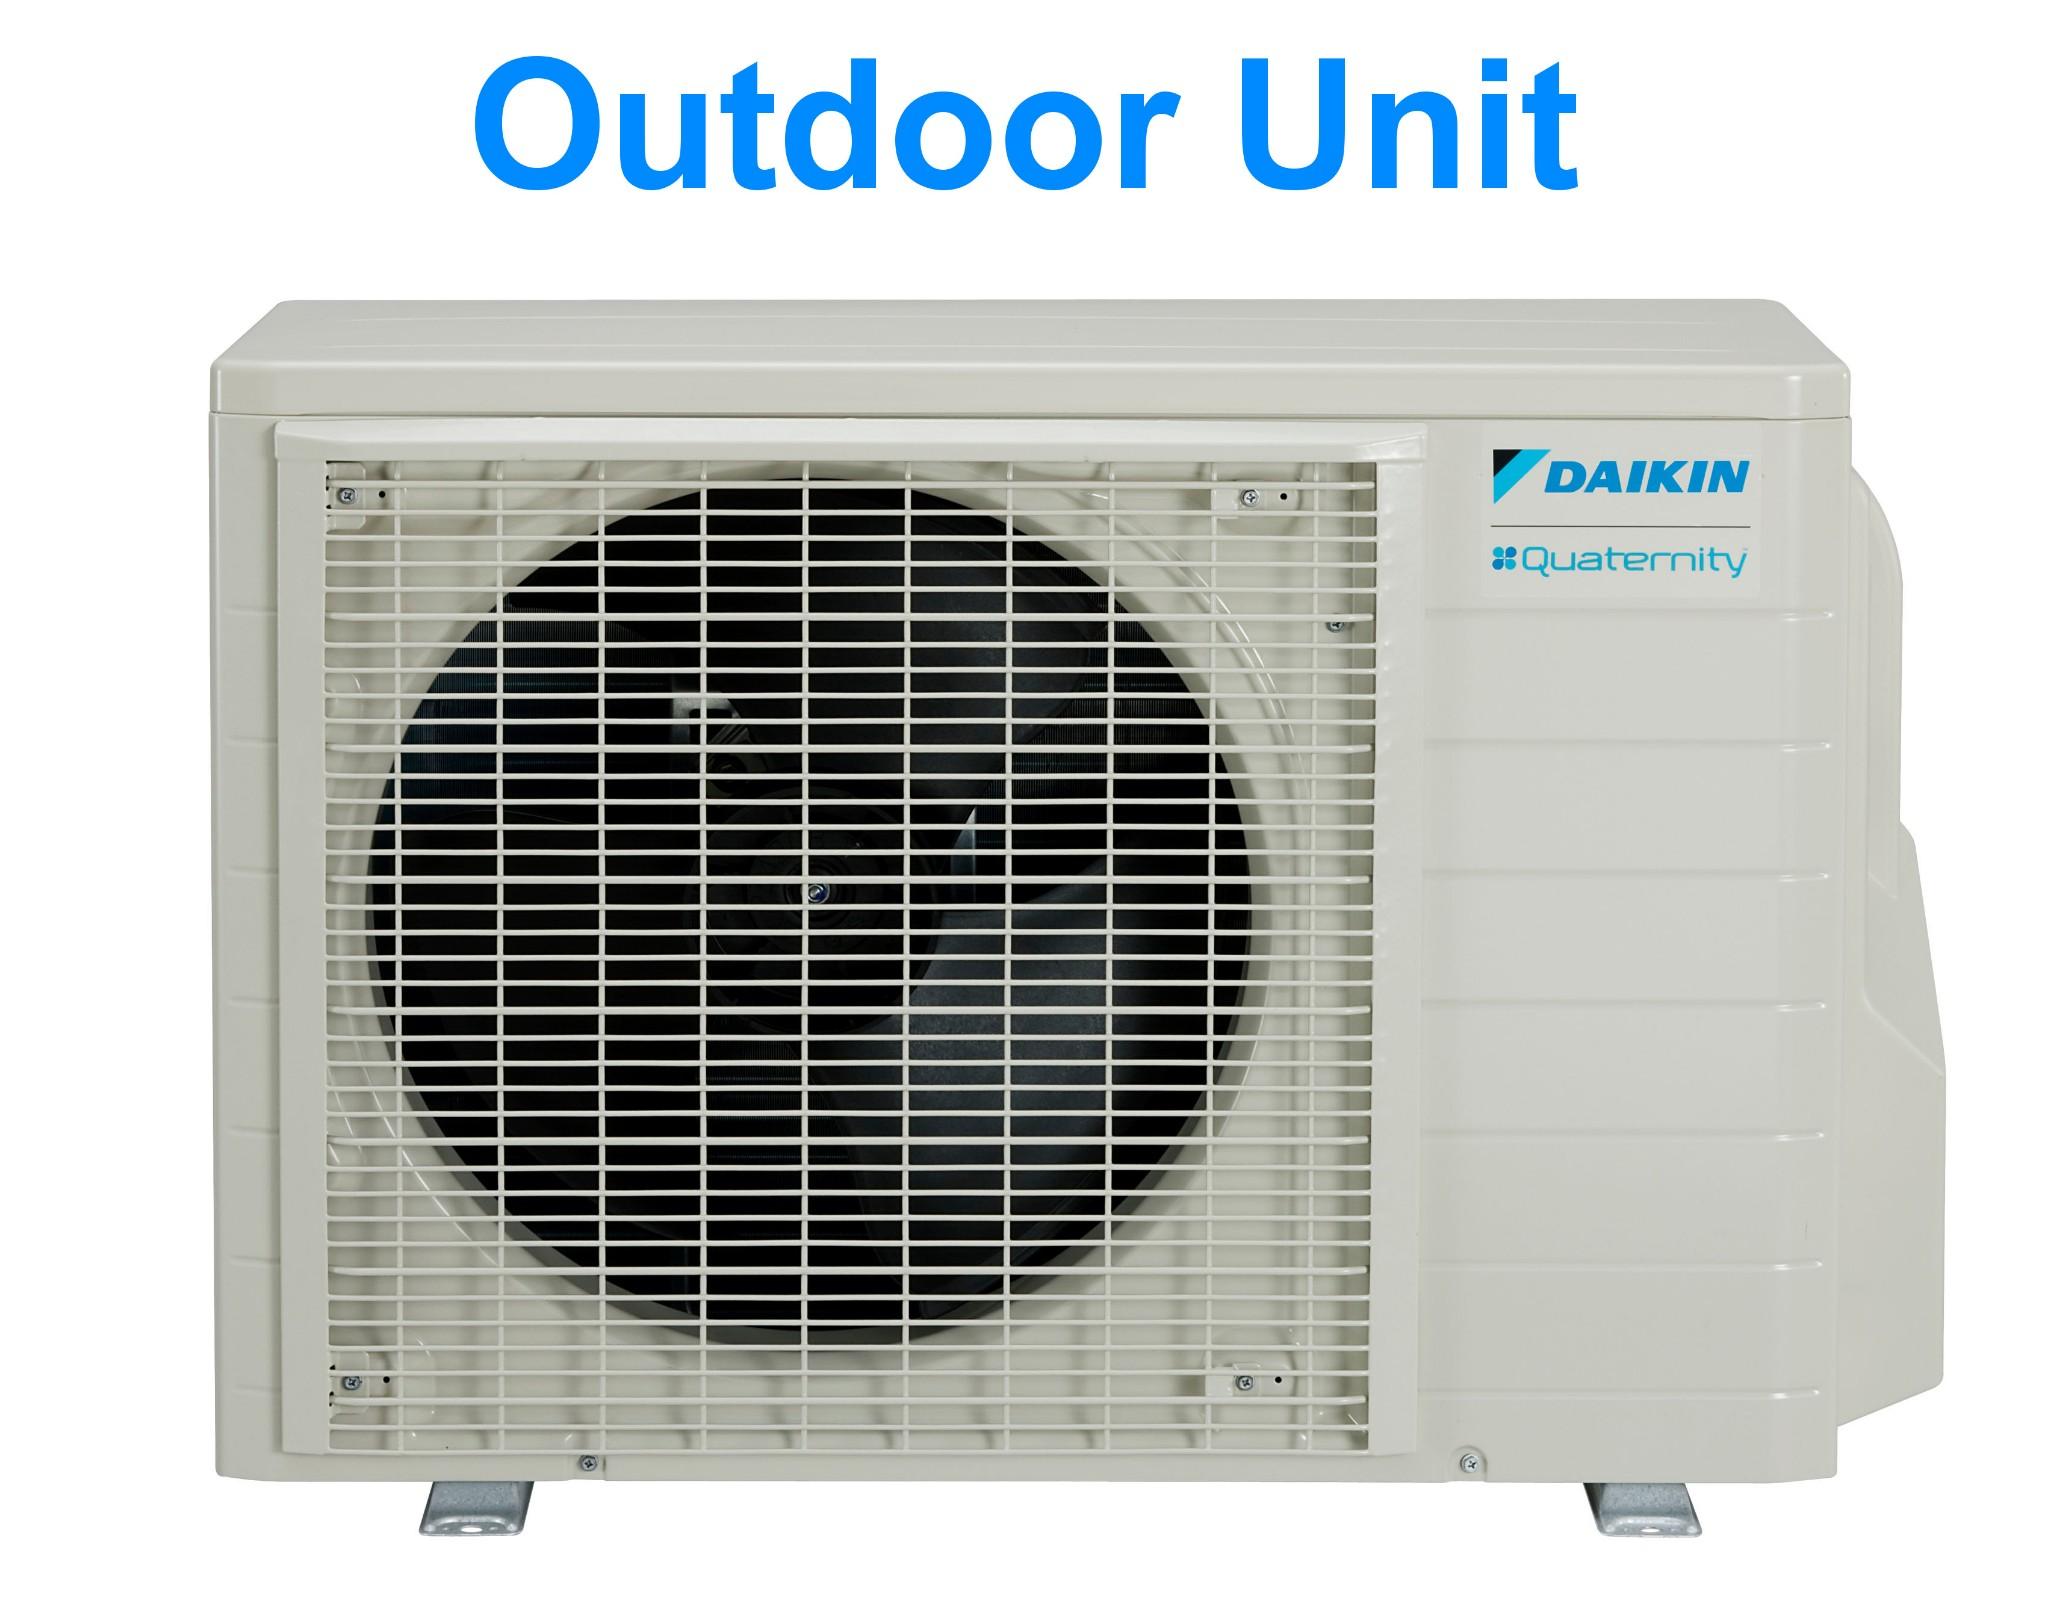 Daikin 9000 btu heat pump mini split air conditioner for 18000 btu heat pump window unit